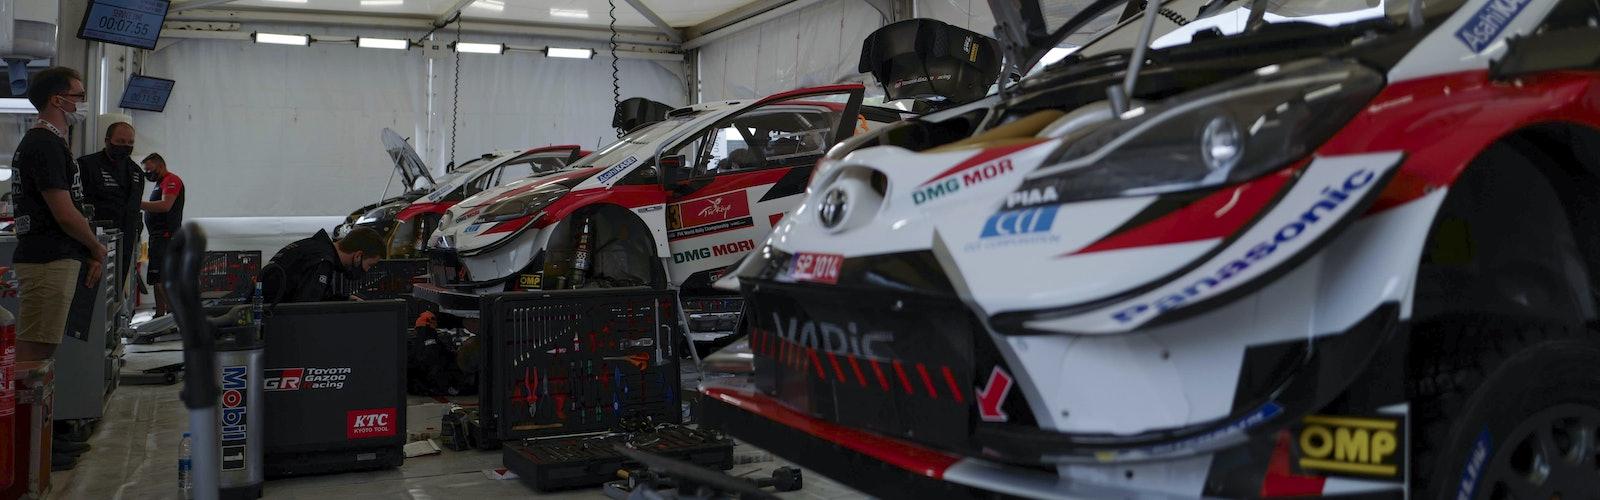 WRC_2020_Rd.5_157